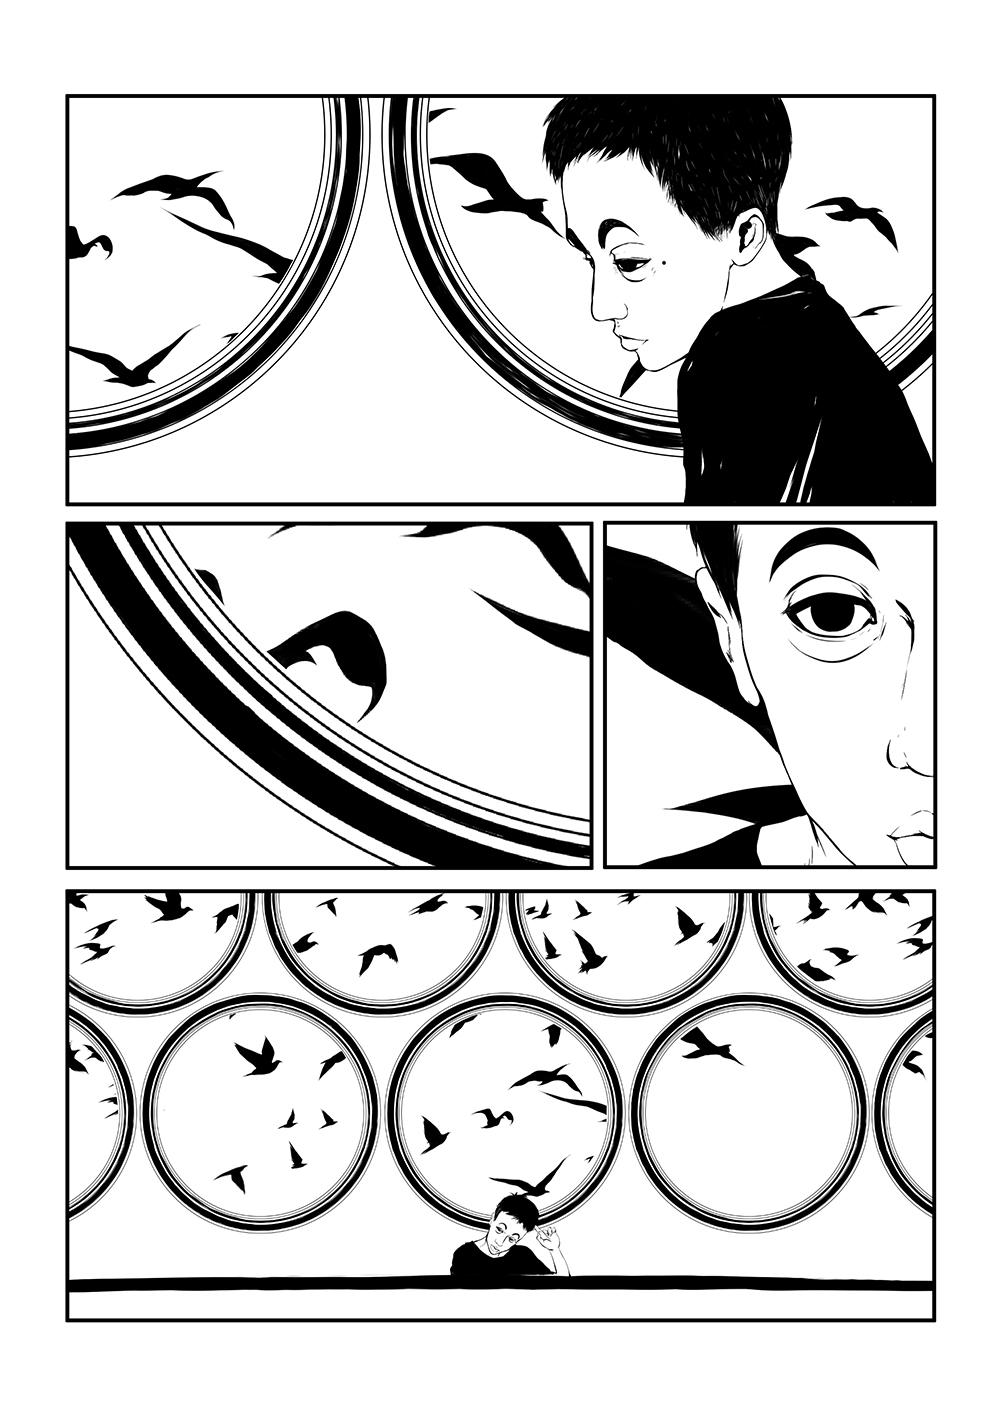 mojowang_illustration_betweenrivers_21_1.jpg